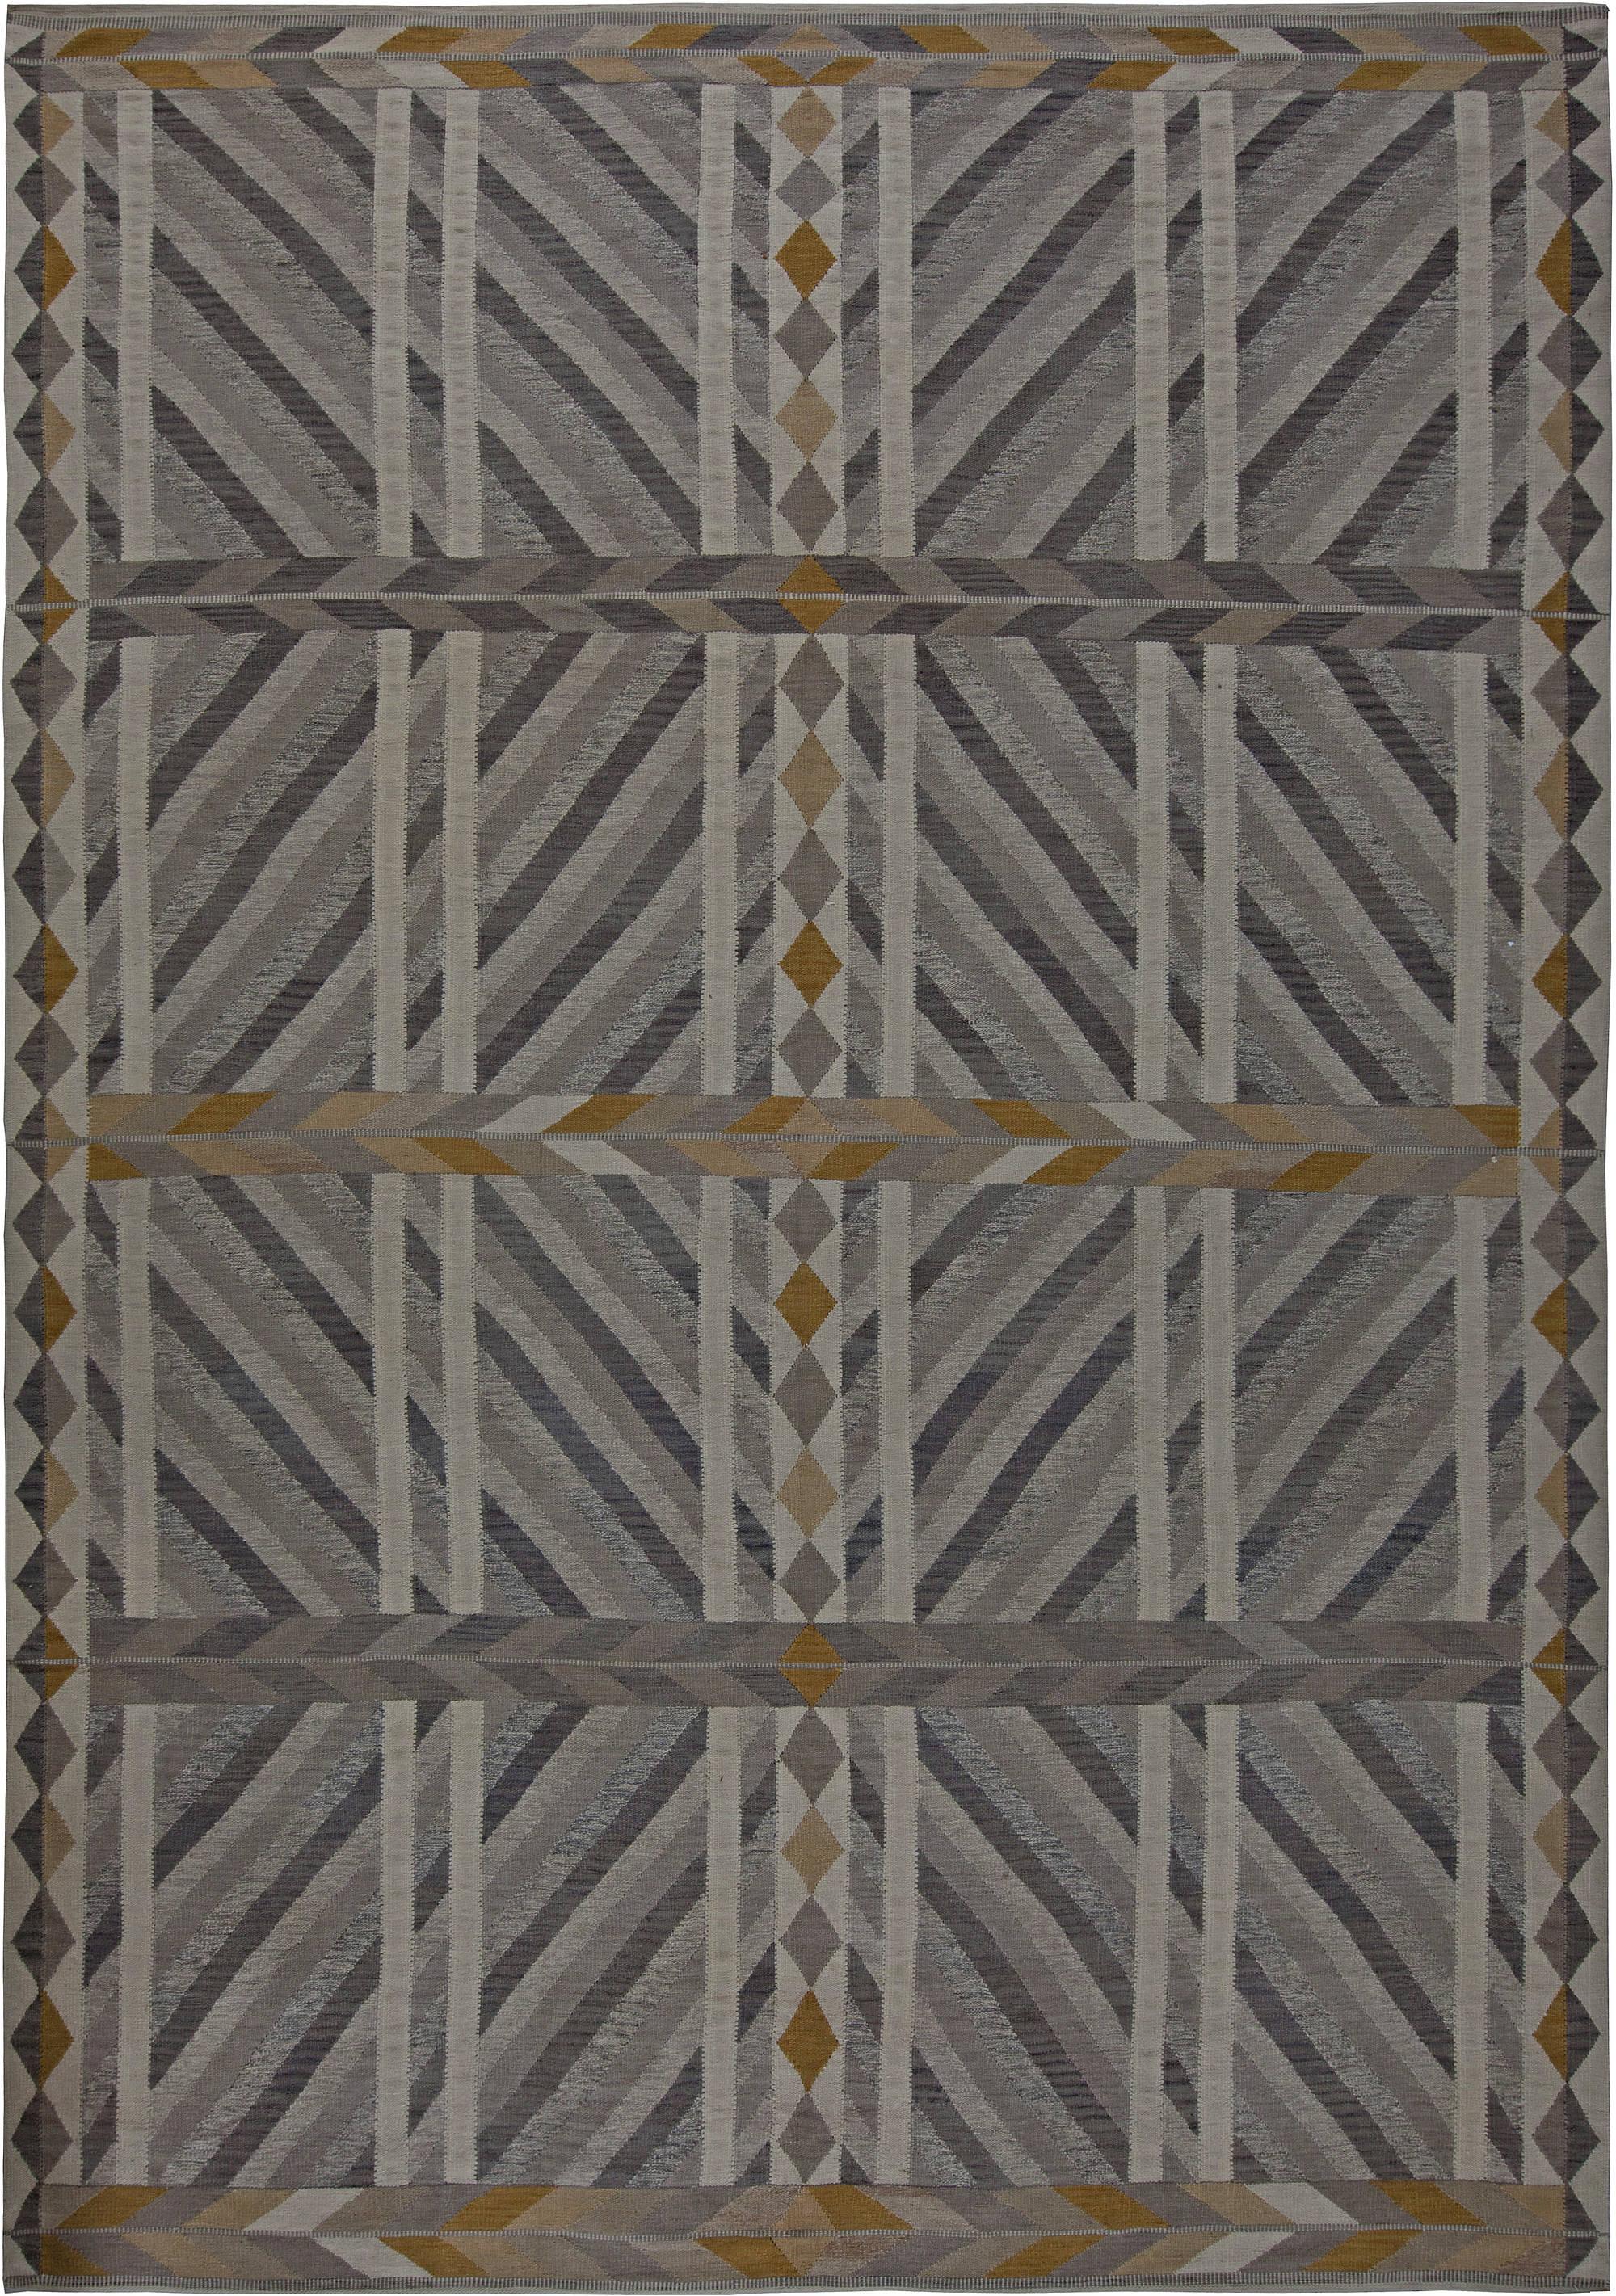 Swedish Flat Weave N11103